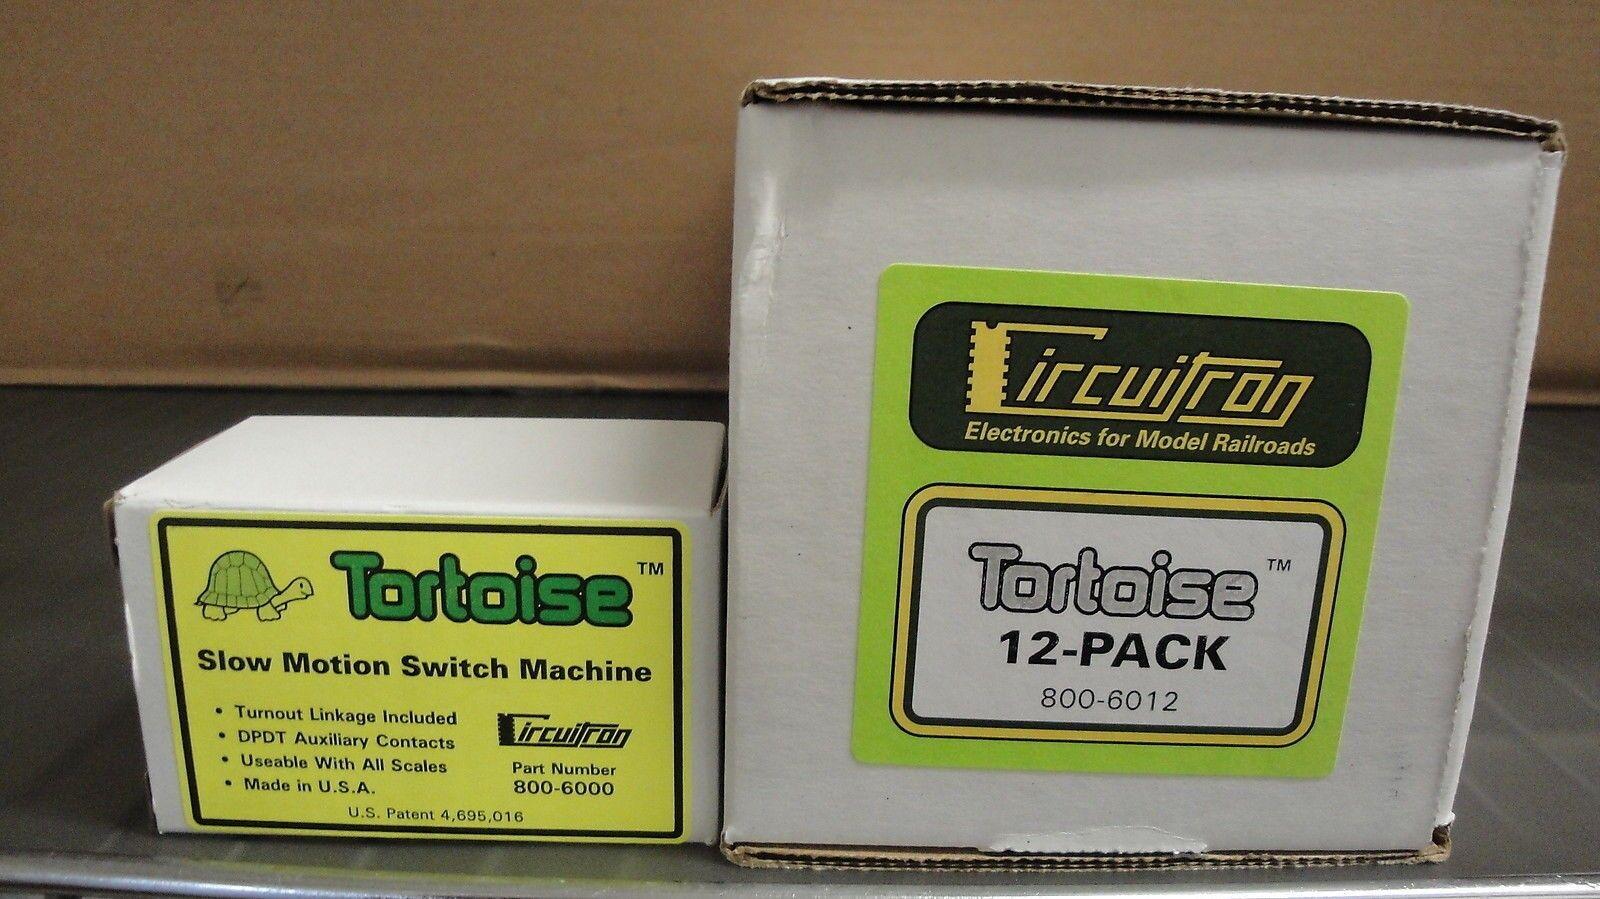 CIRCUITRON 6012 12-PK Tortoise Switch Machine Slow-Motion Turnouts MODELRRSUPPLY